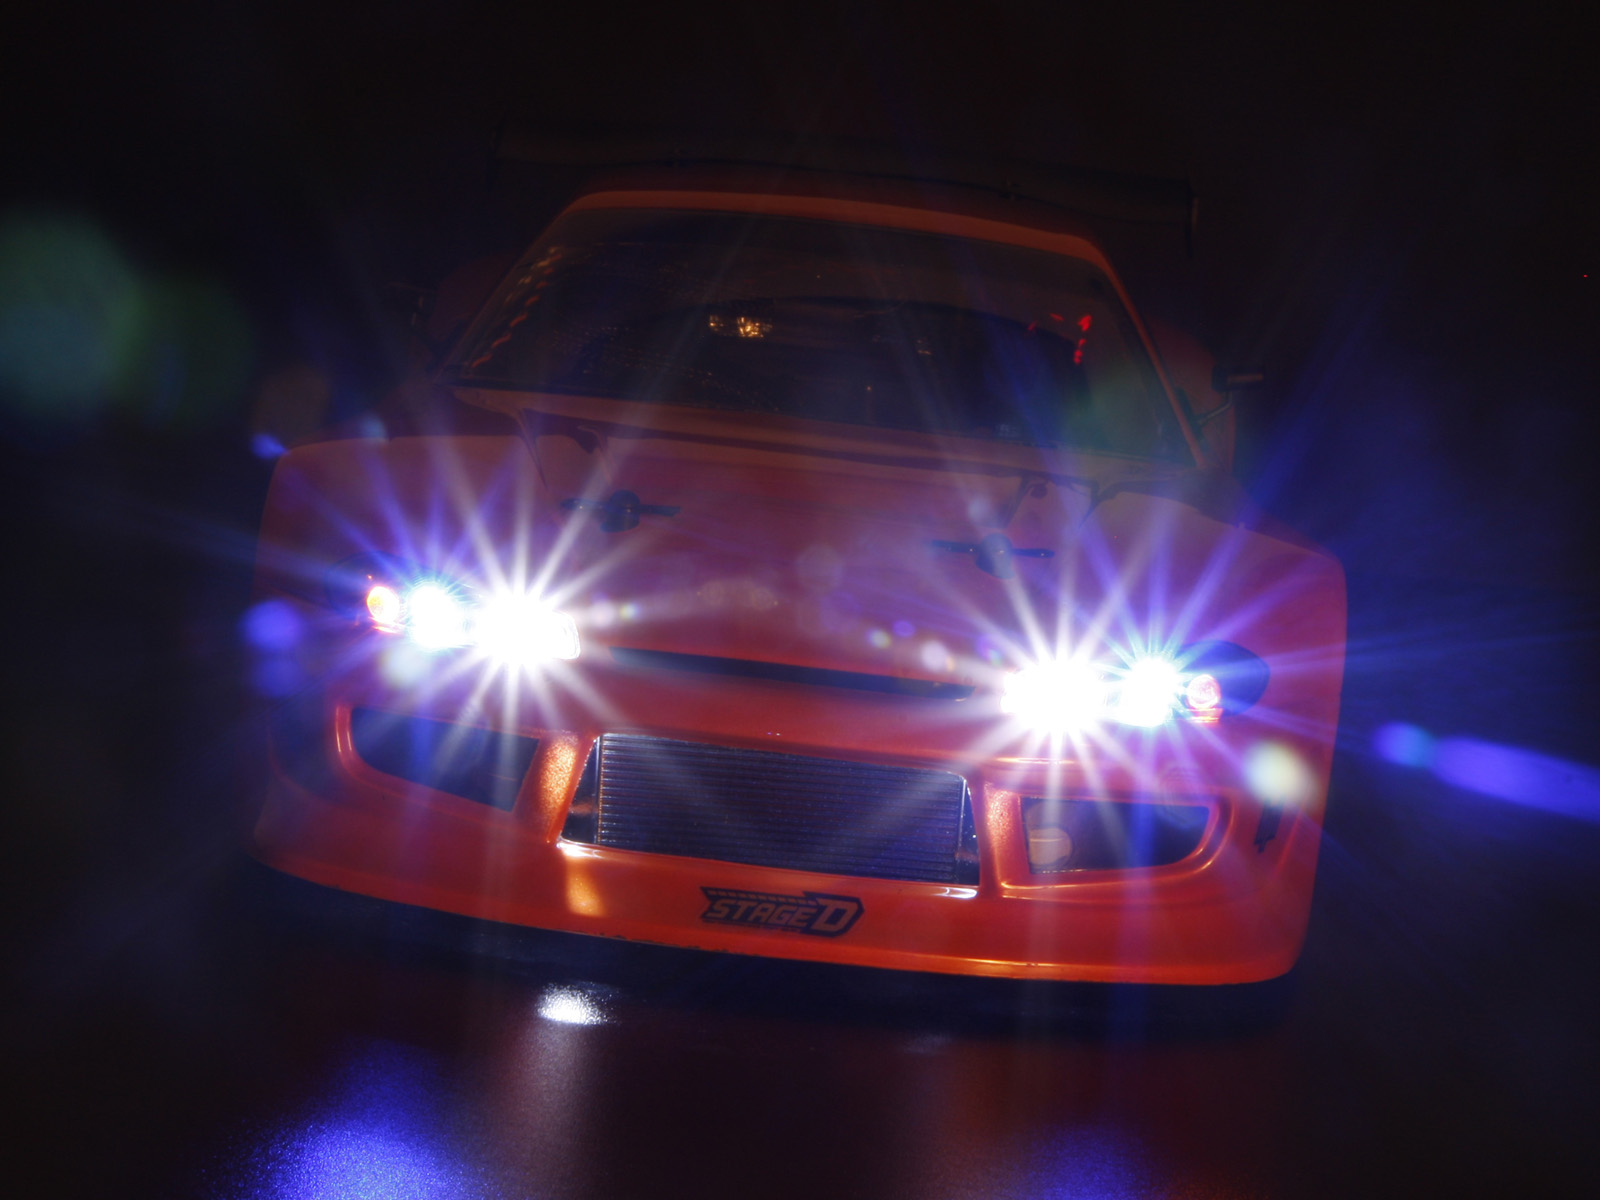 Ксеноновая лампа на автомобиле